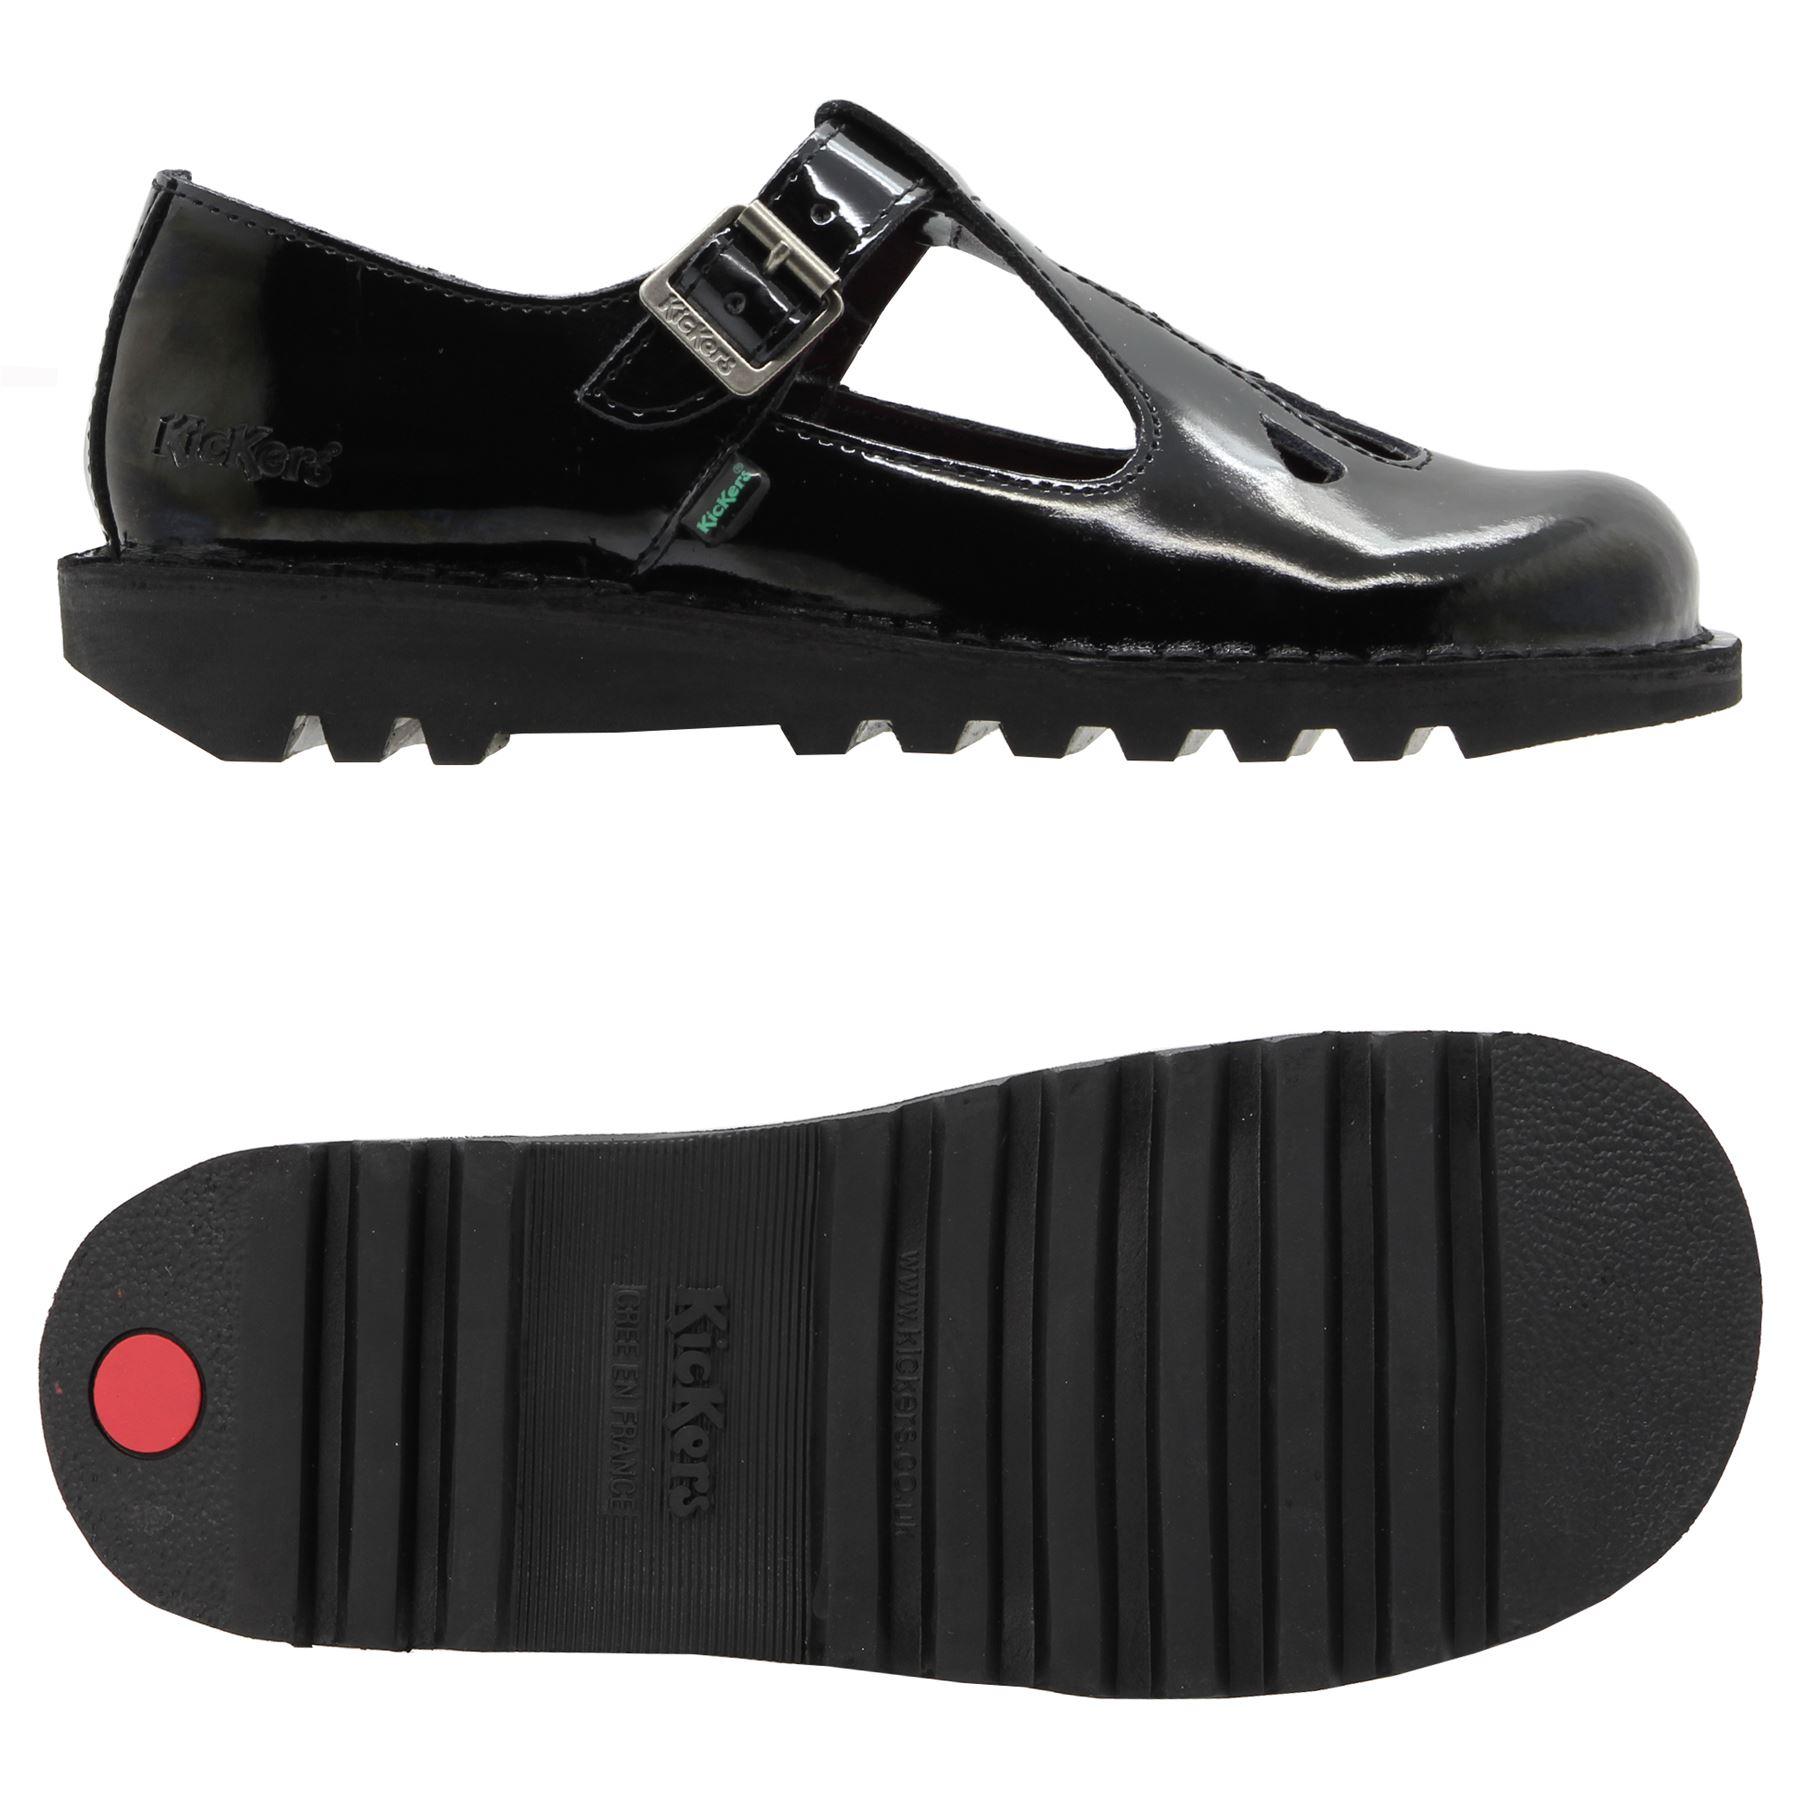 Black kicker sandals - Kickers Women S Sizes Uk 3 4 5 6 7 8 Kick Lo Adlar Patent Shoes Black Leather